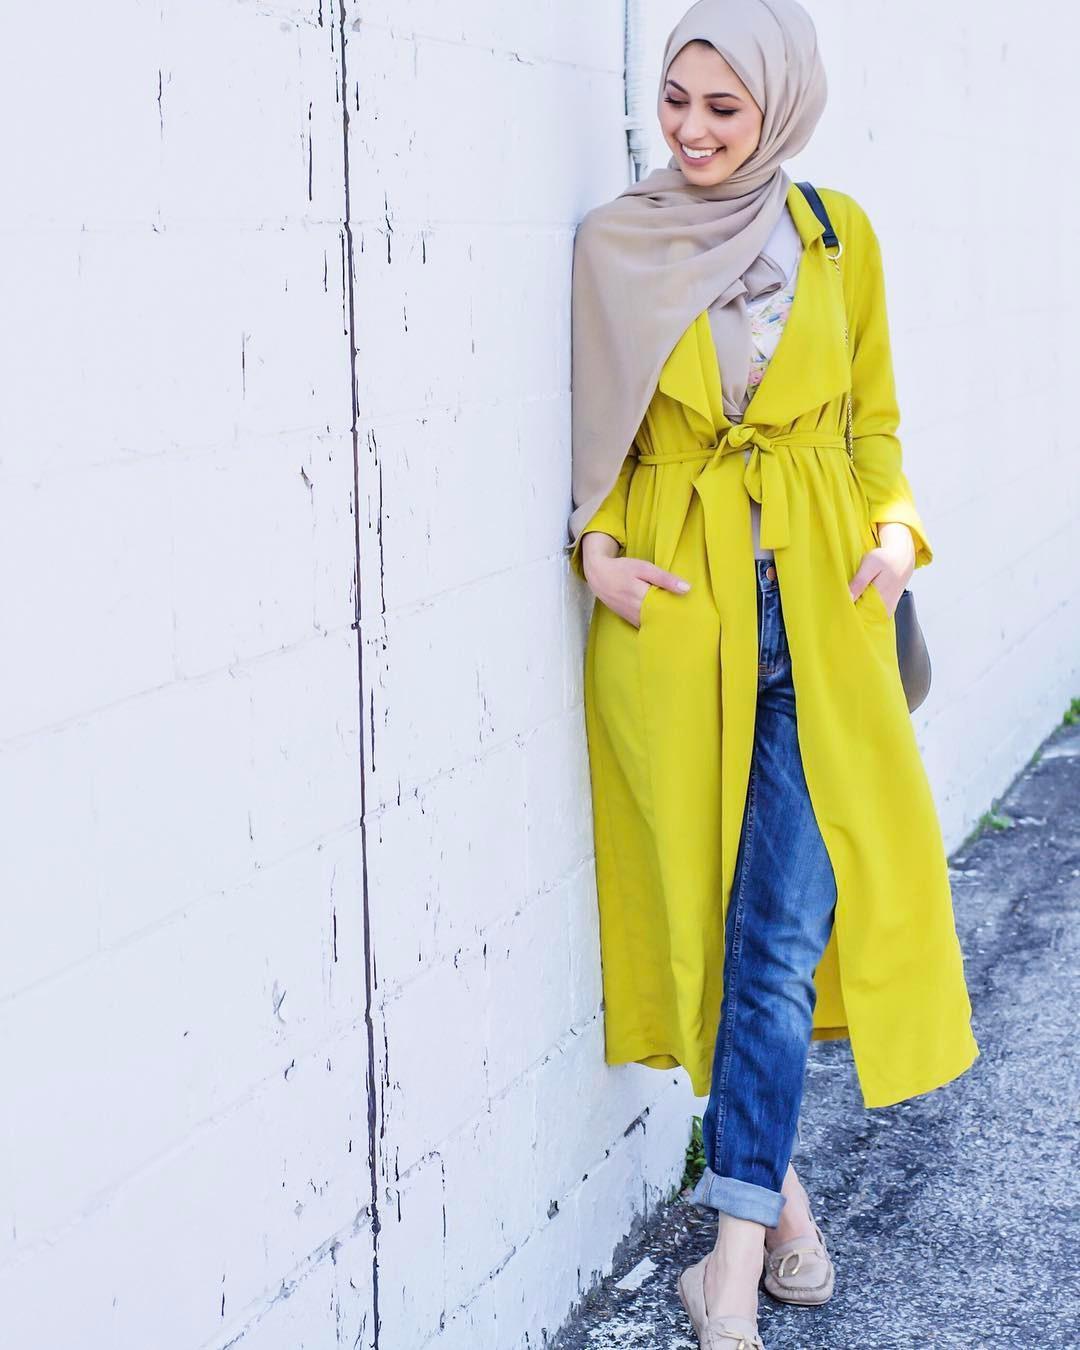 Gaya busana hijab ala hijabers. (sumber foto: @hanantehaili/instagram)